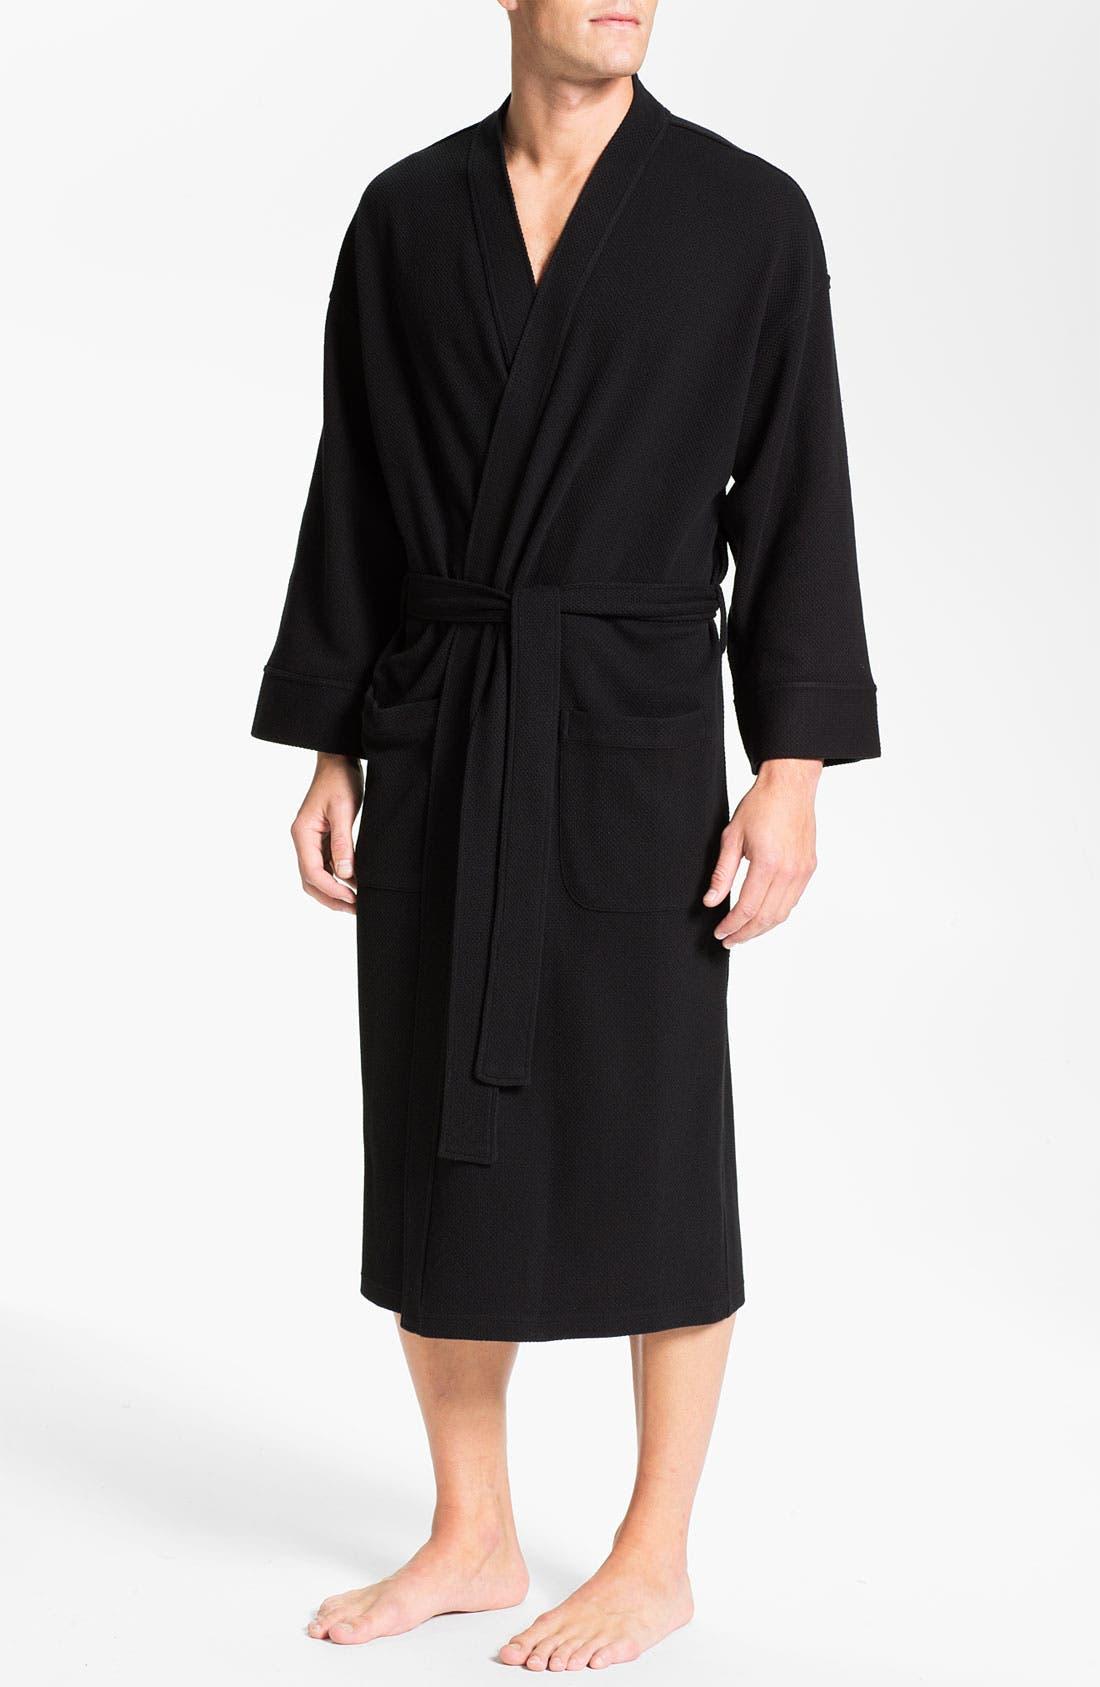 Main Image - Nordstrom Men's Shop Thermal Robe